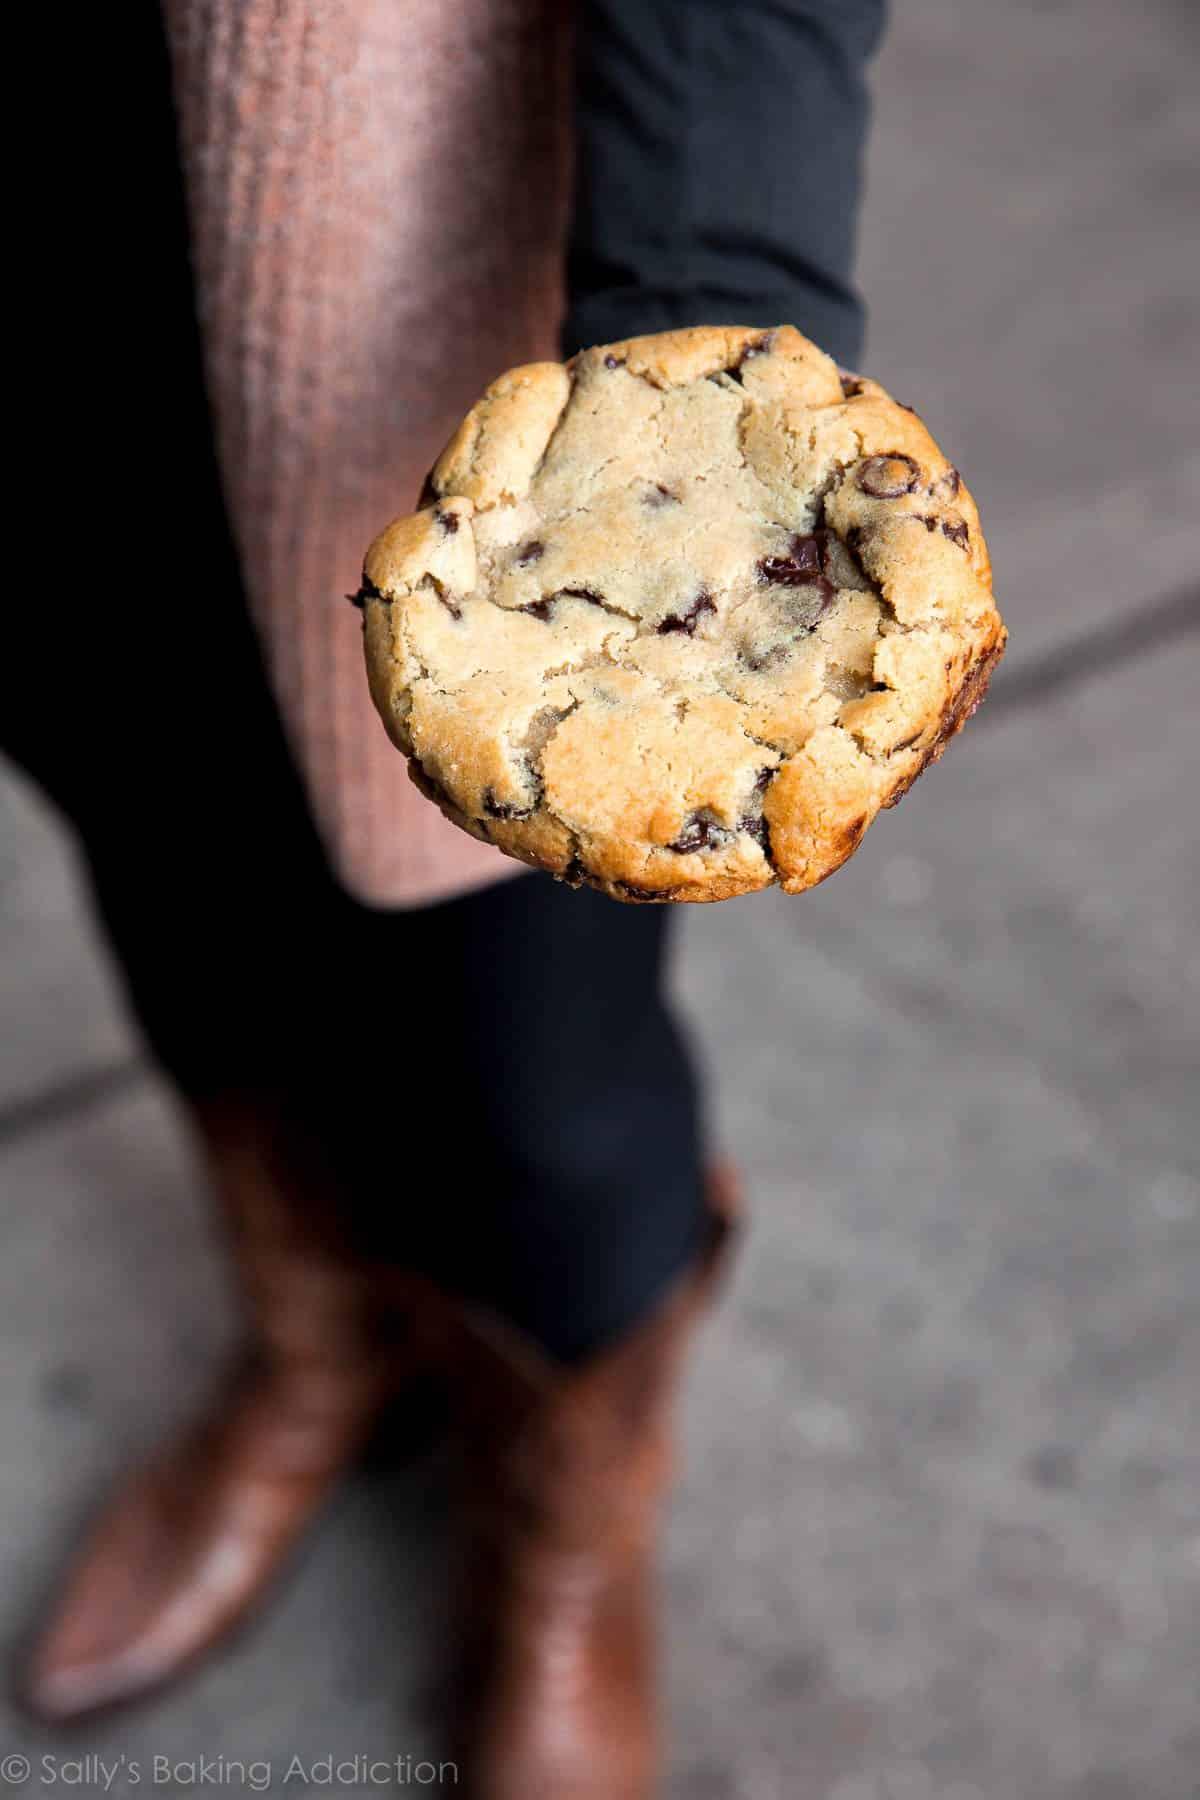 sallys-baking-addiction-nyc-bakery-tour-11